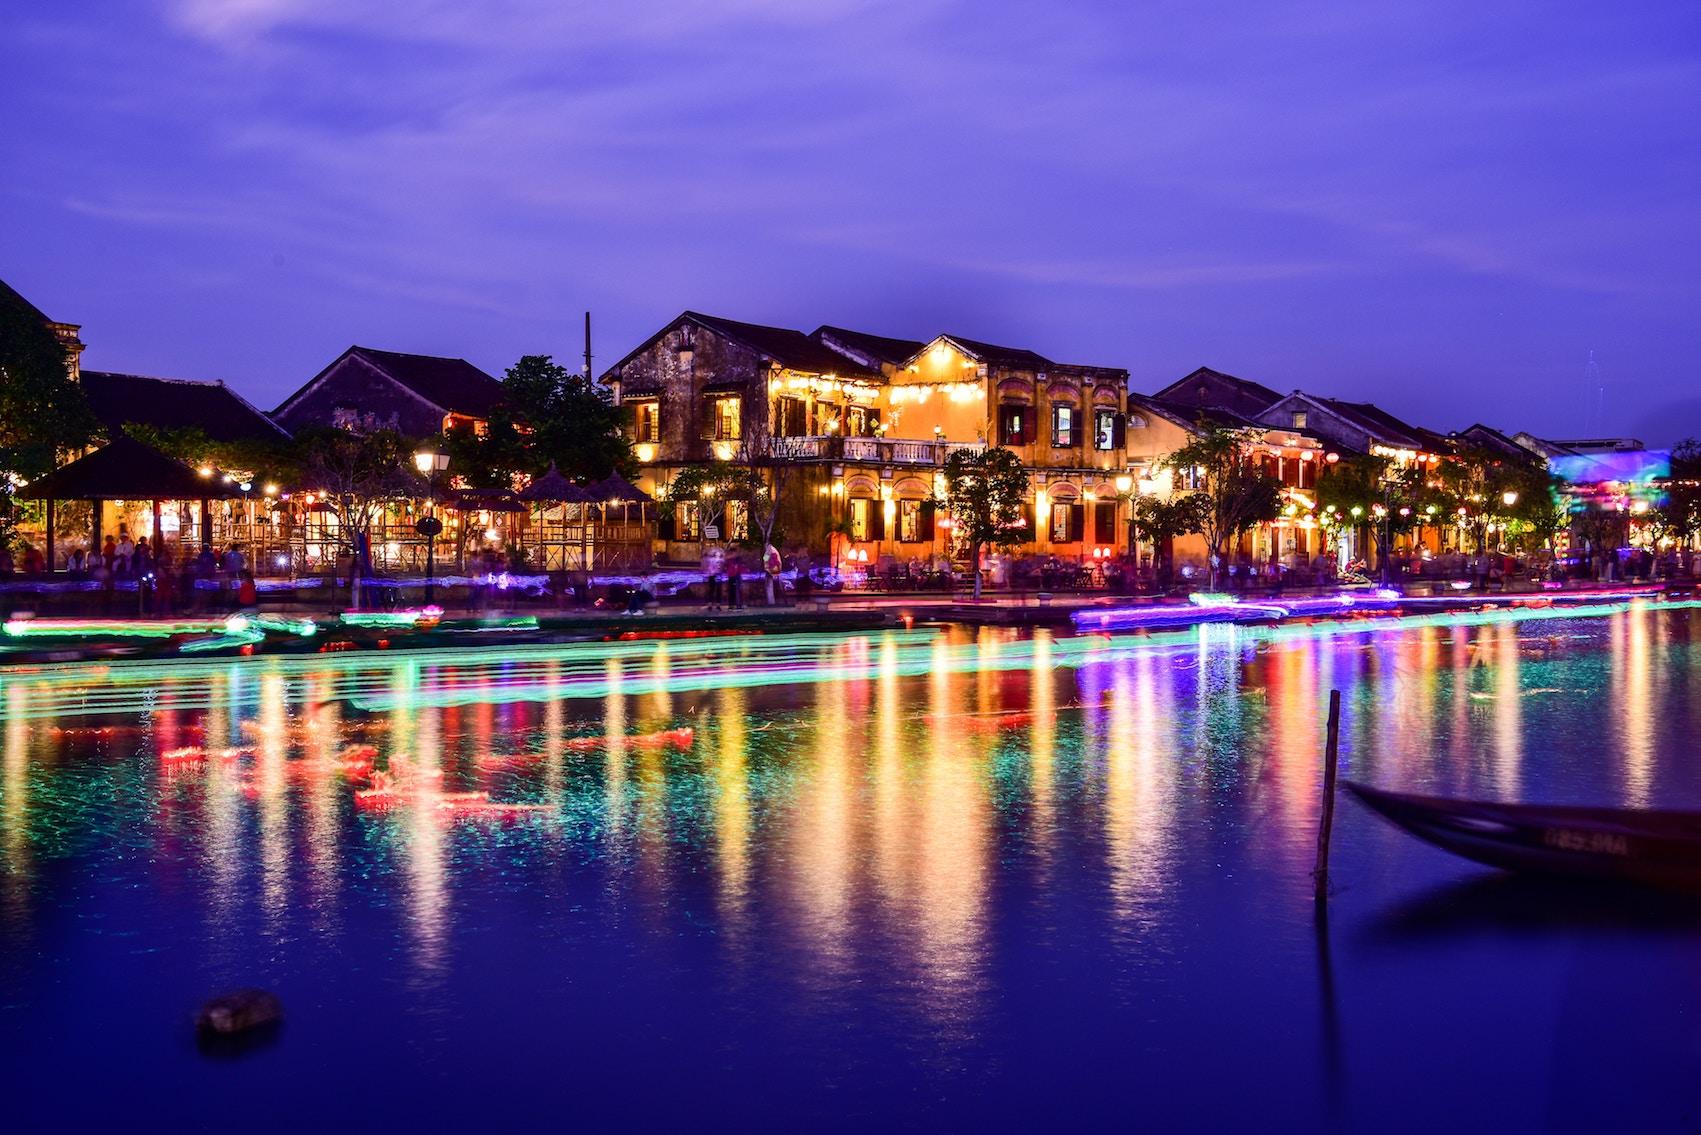 alternative-new-year-retreat-hoi-an-vietnam.jpg